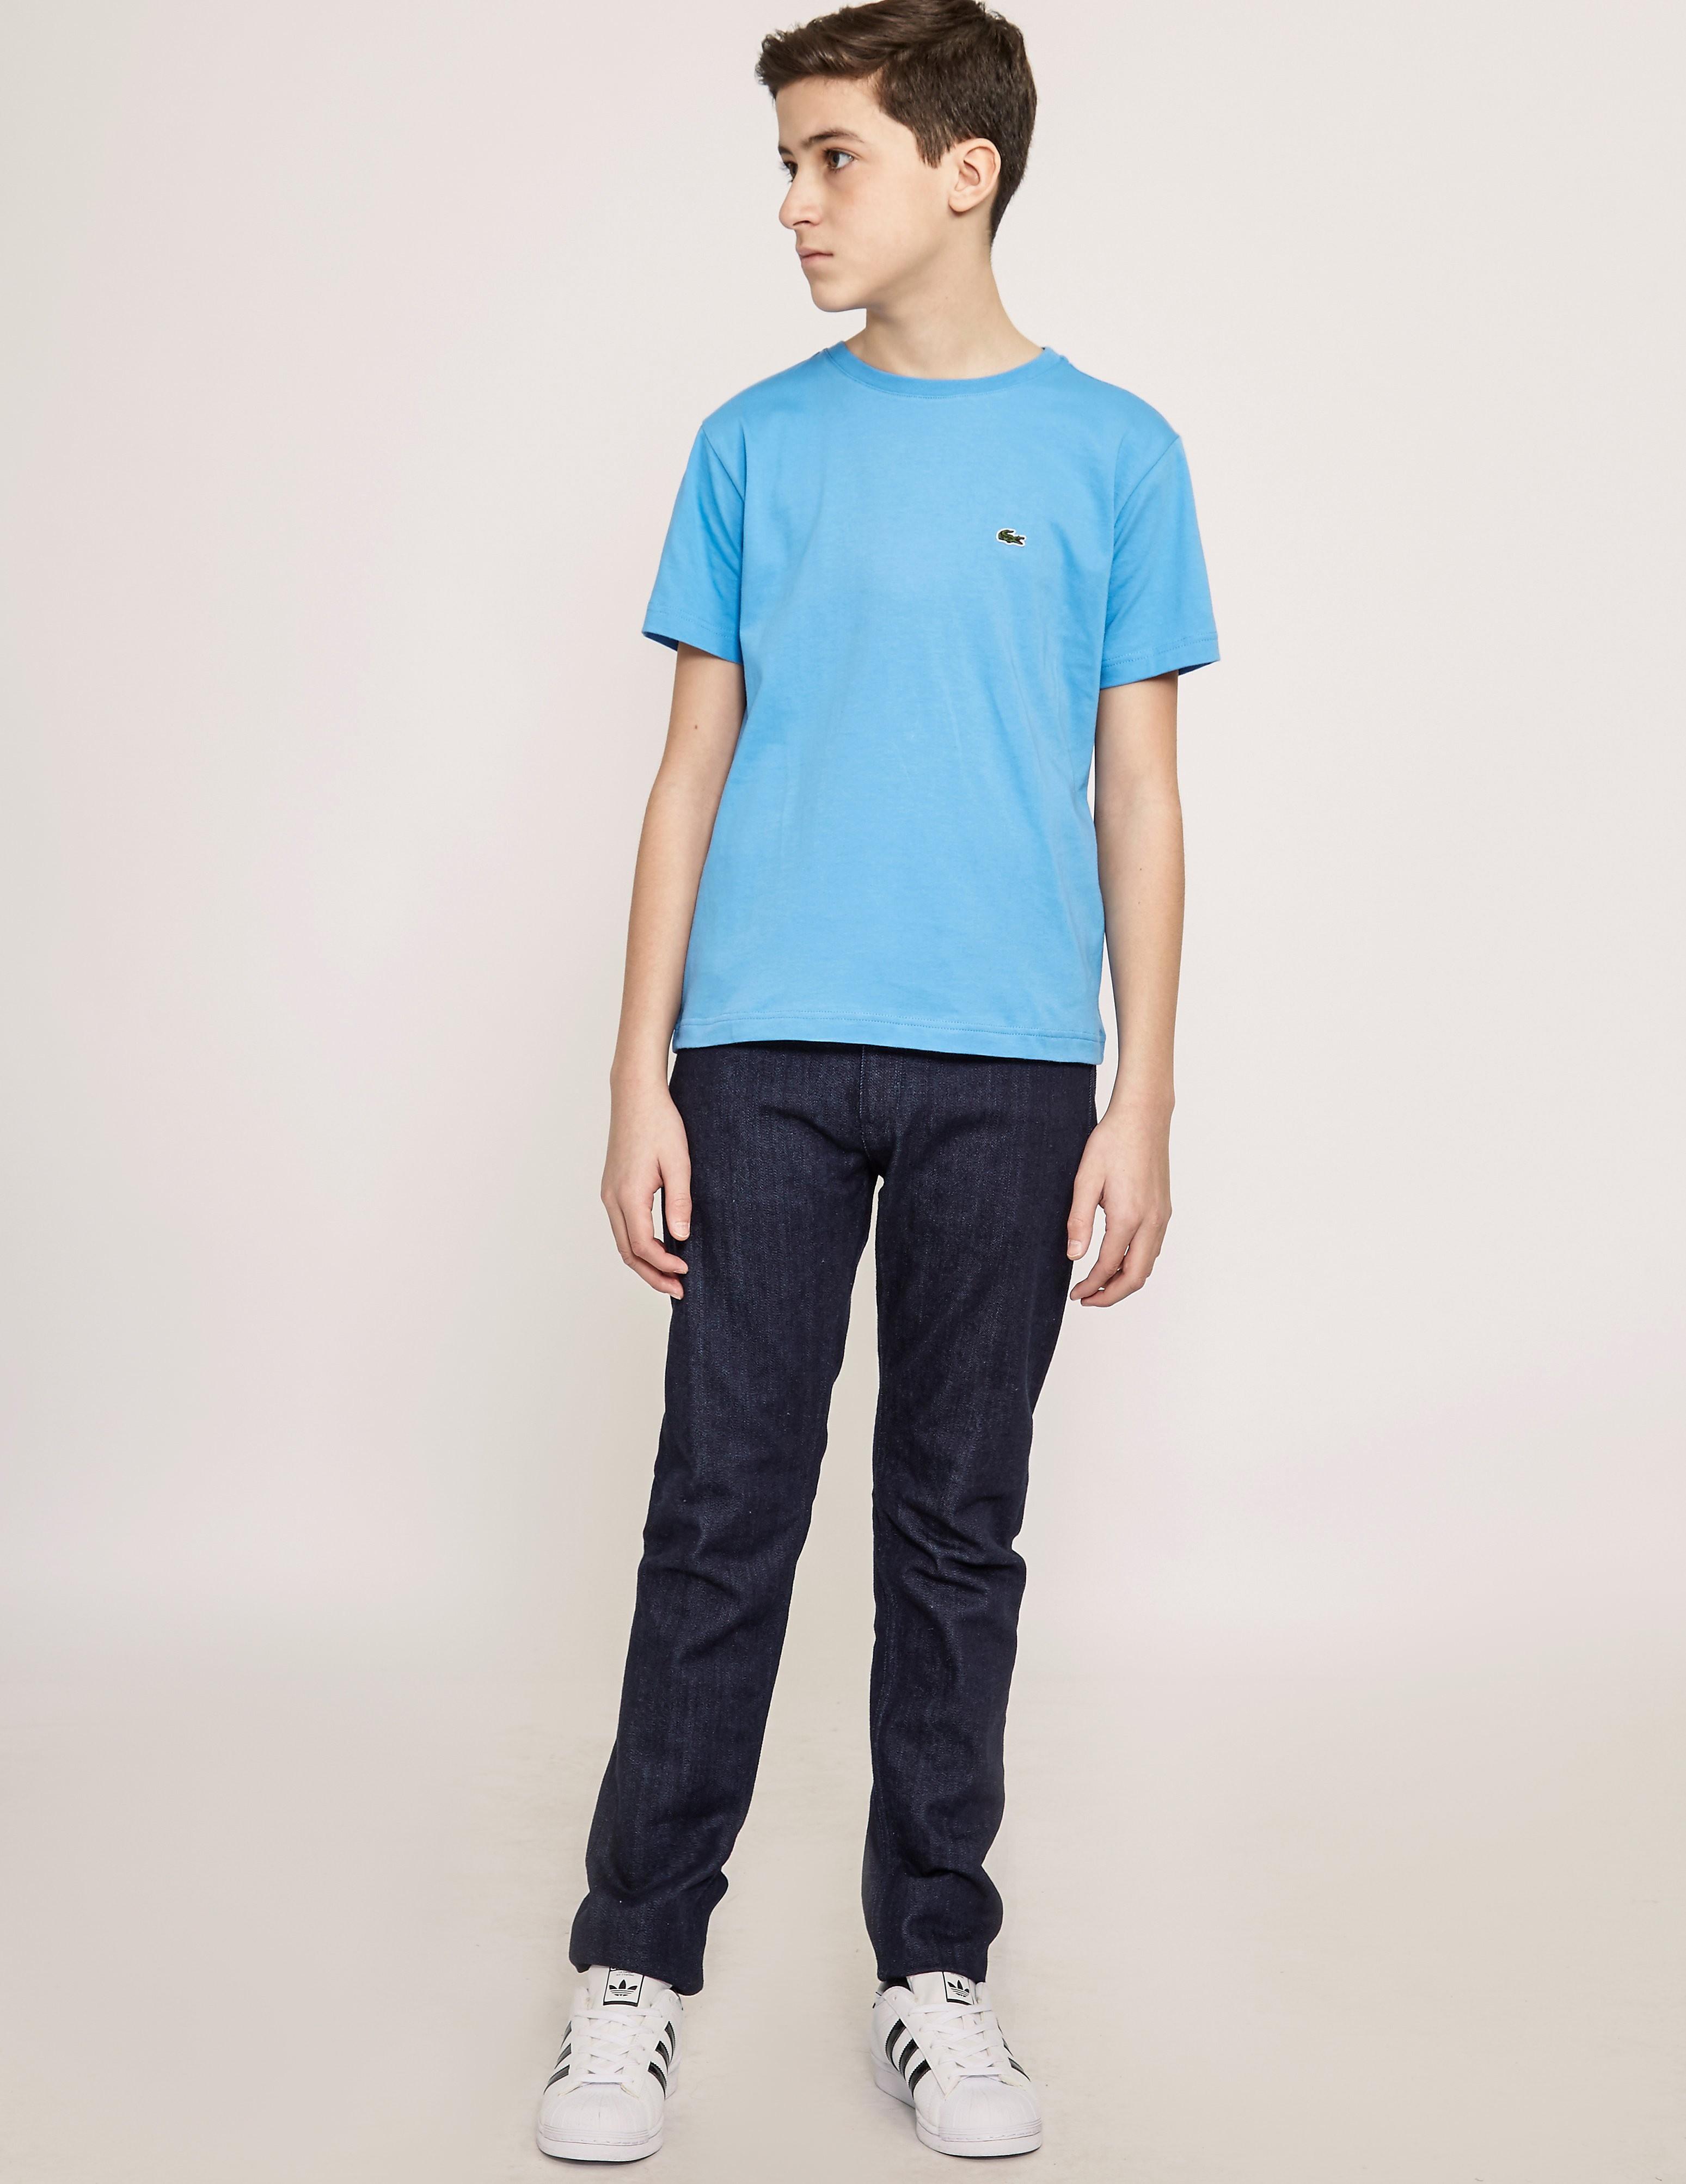 Lacoste Crew T-Shirt